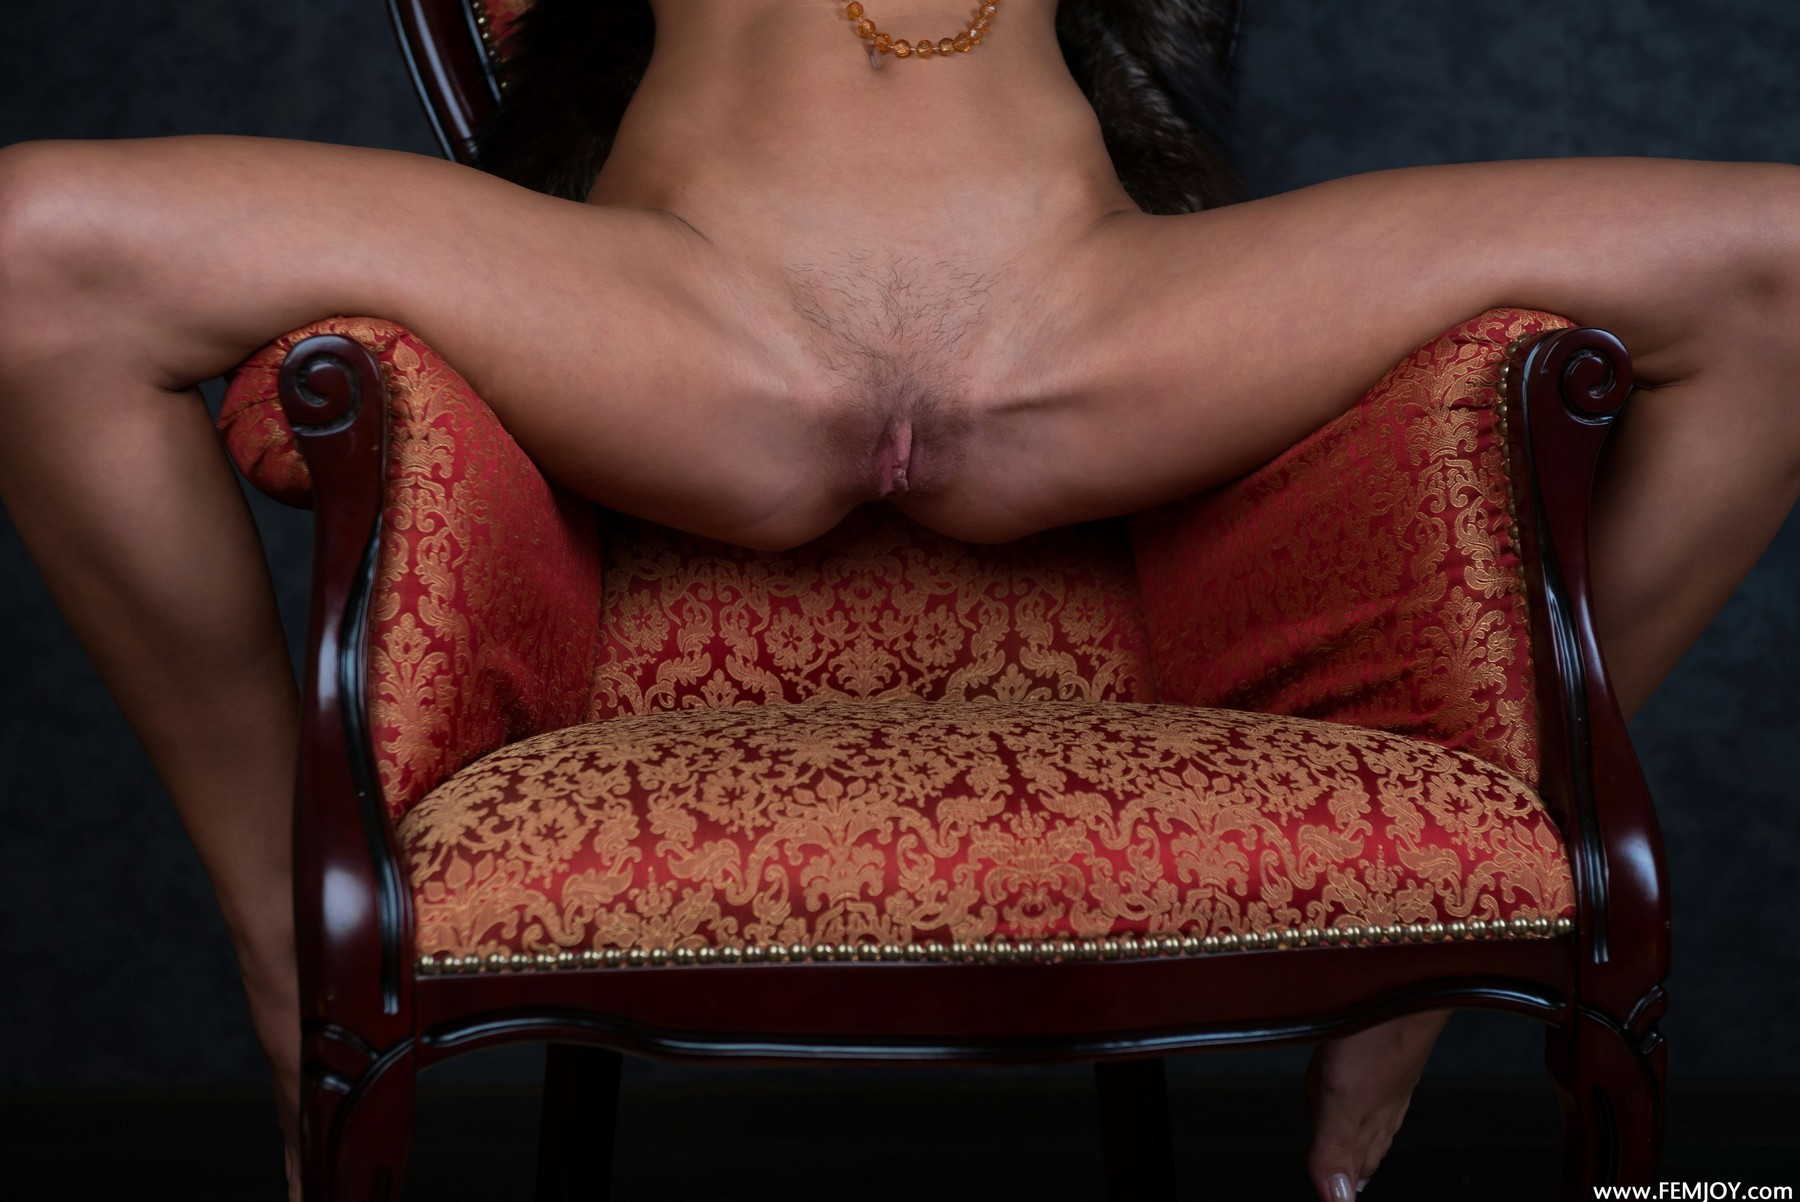 nonna-armchair-femjoy-08